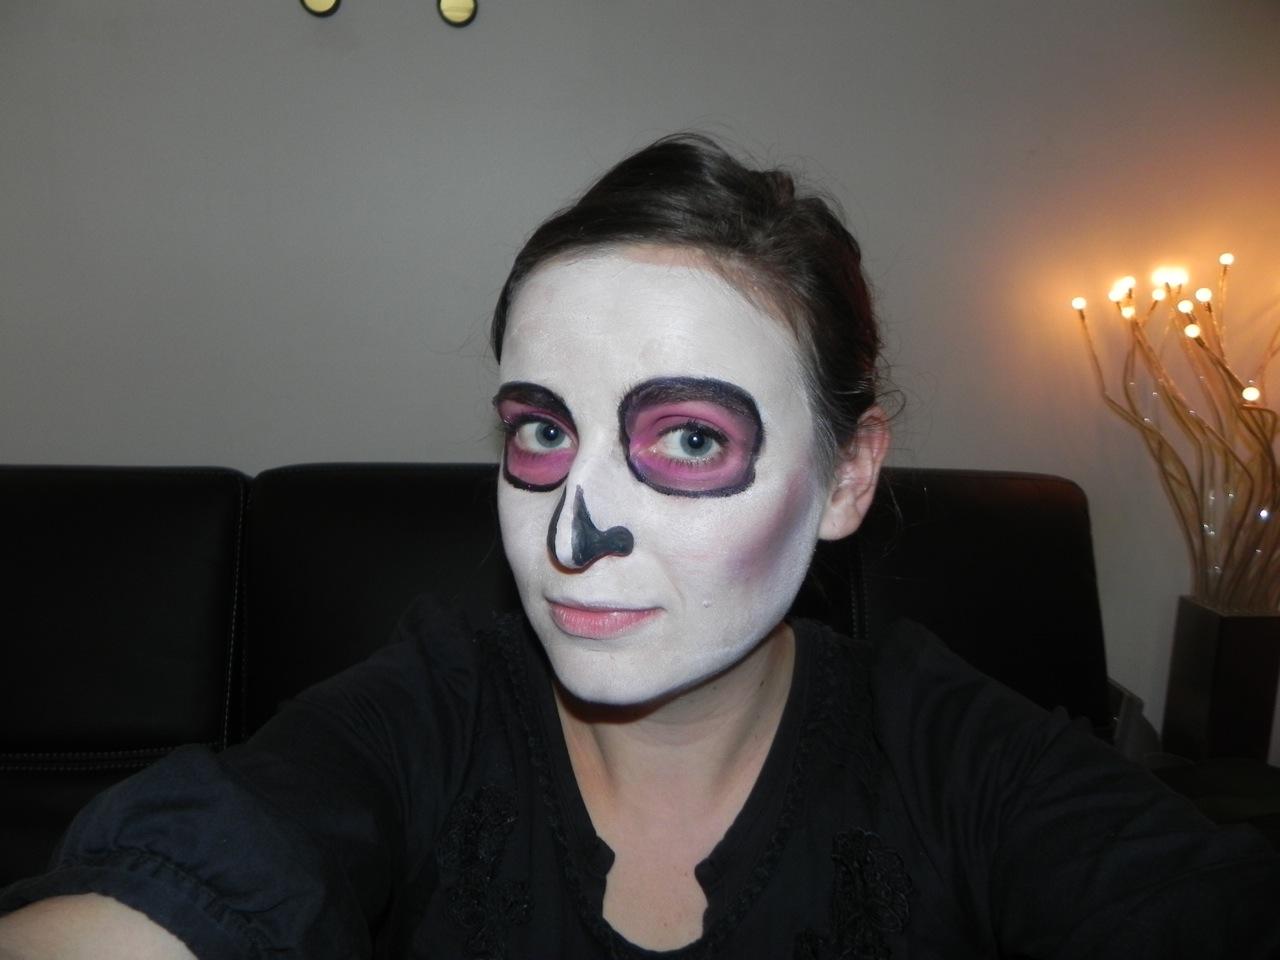 Maquillage halloween mexicain fashion designs - Maquillage halloween mexicain ...